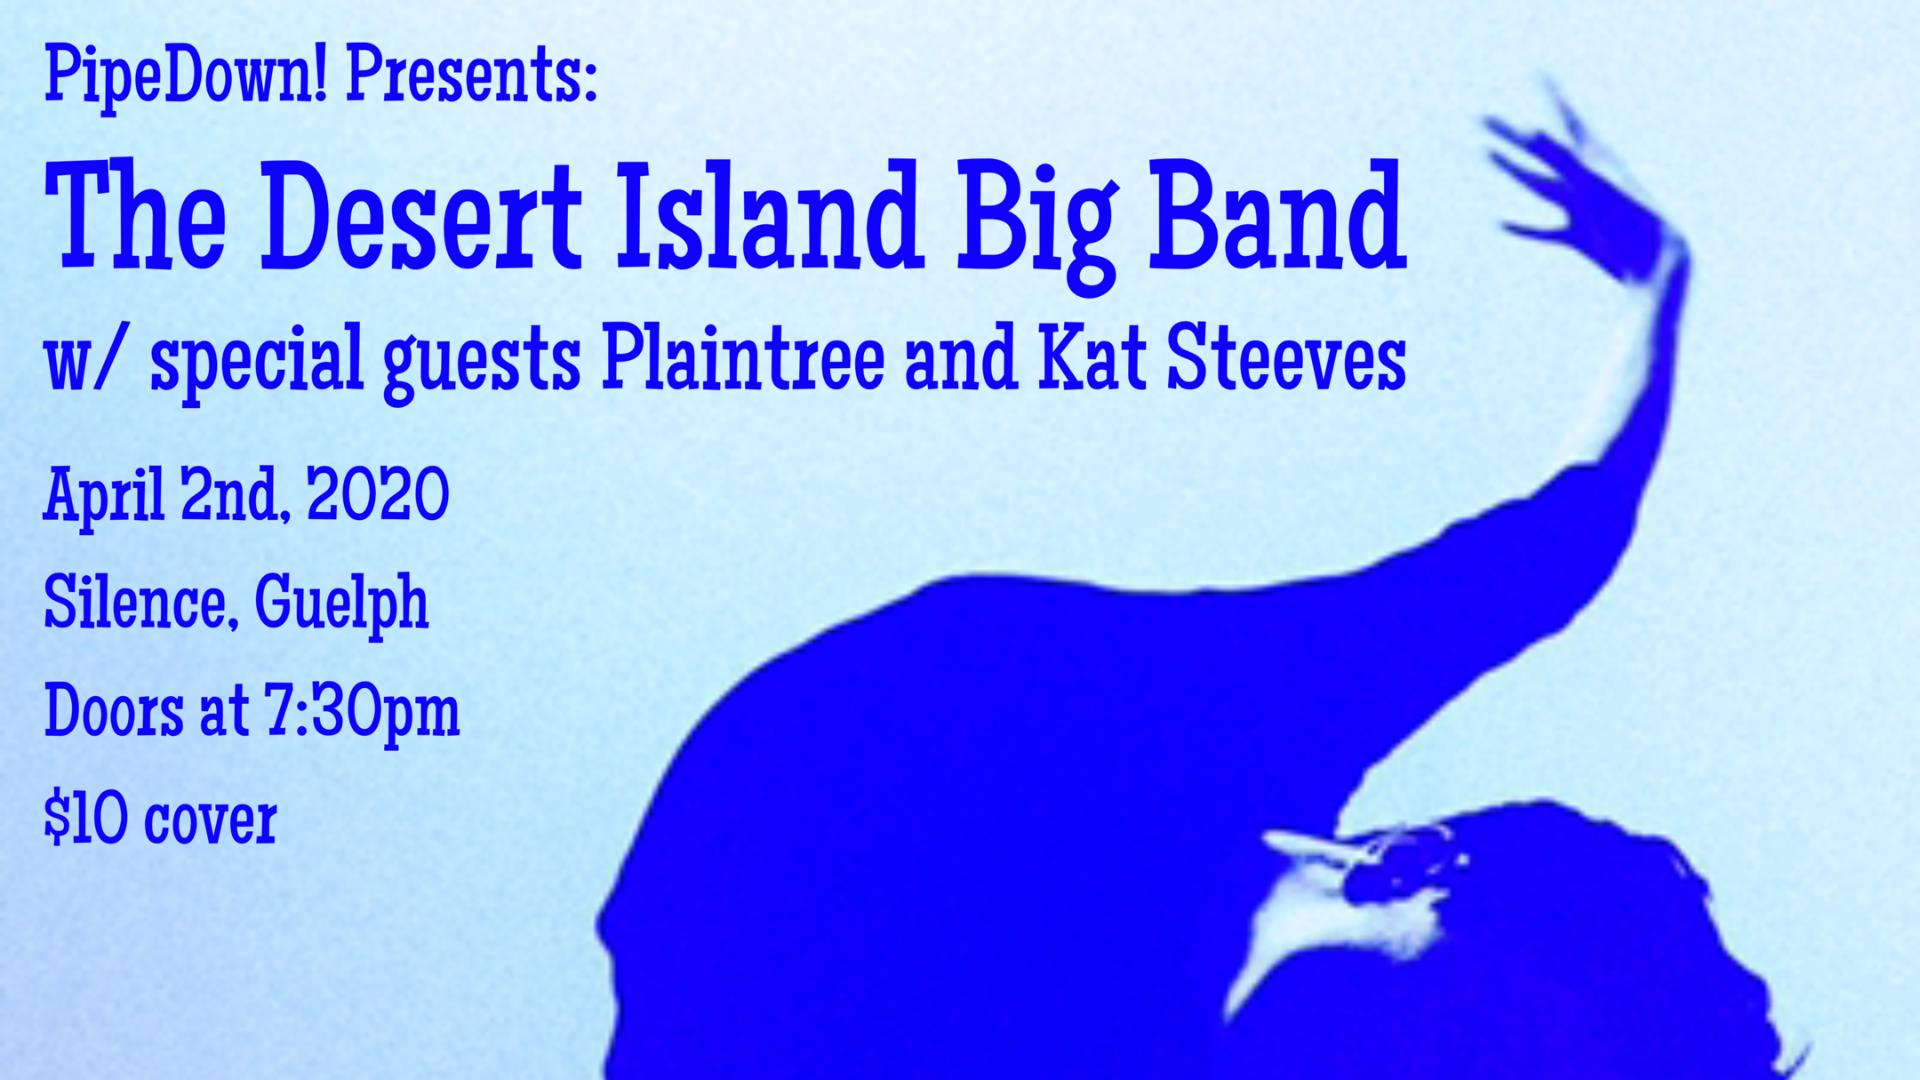 Pipedown! Presents The Desert Island Big Band wsg Kat Steeves & Plaintree